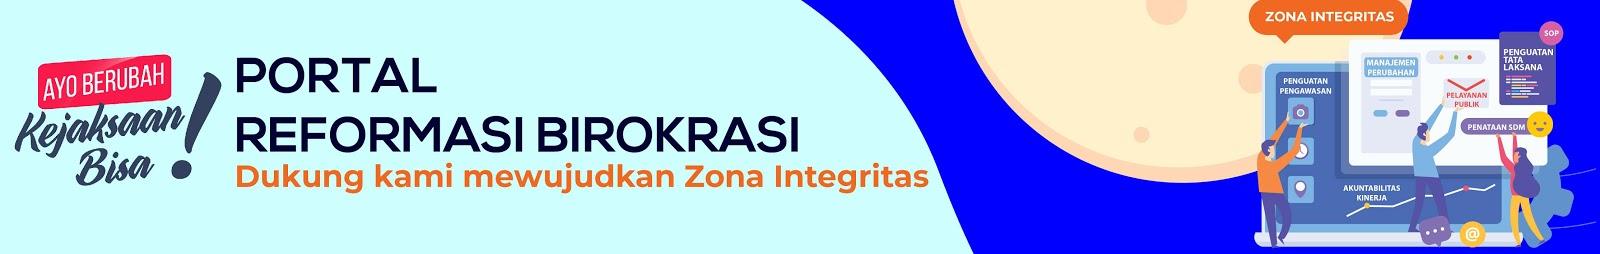 Portal Reformasi Birokrasi